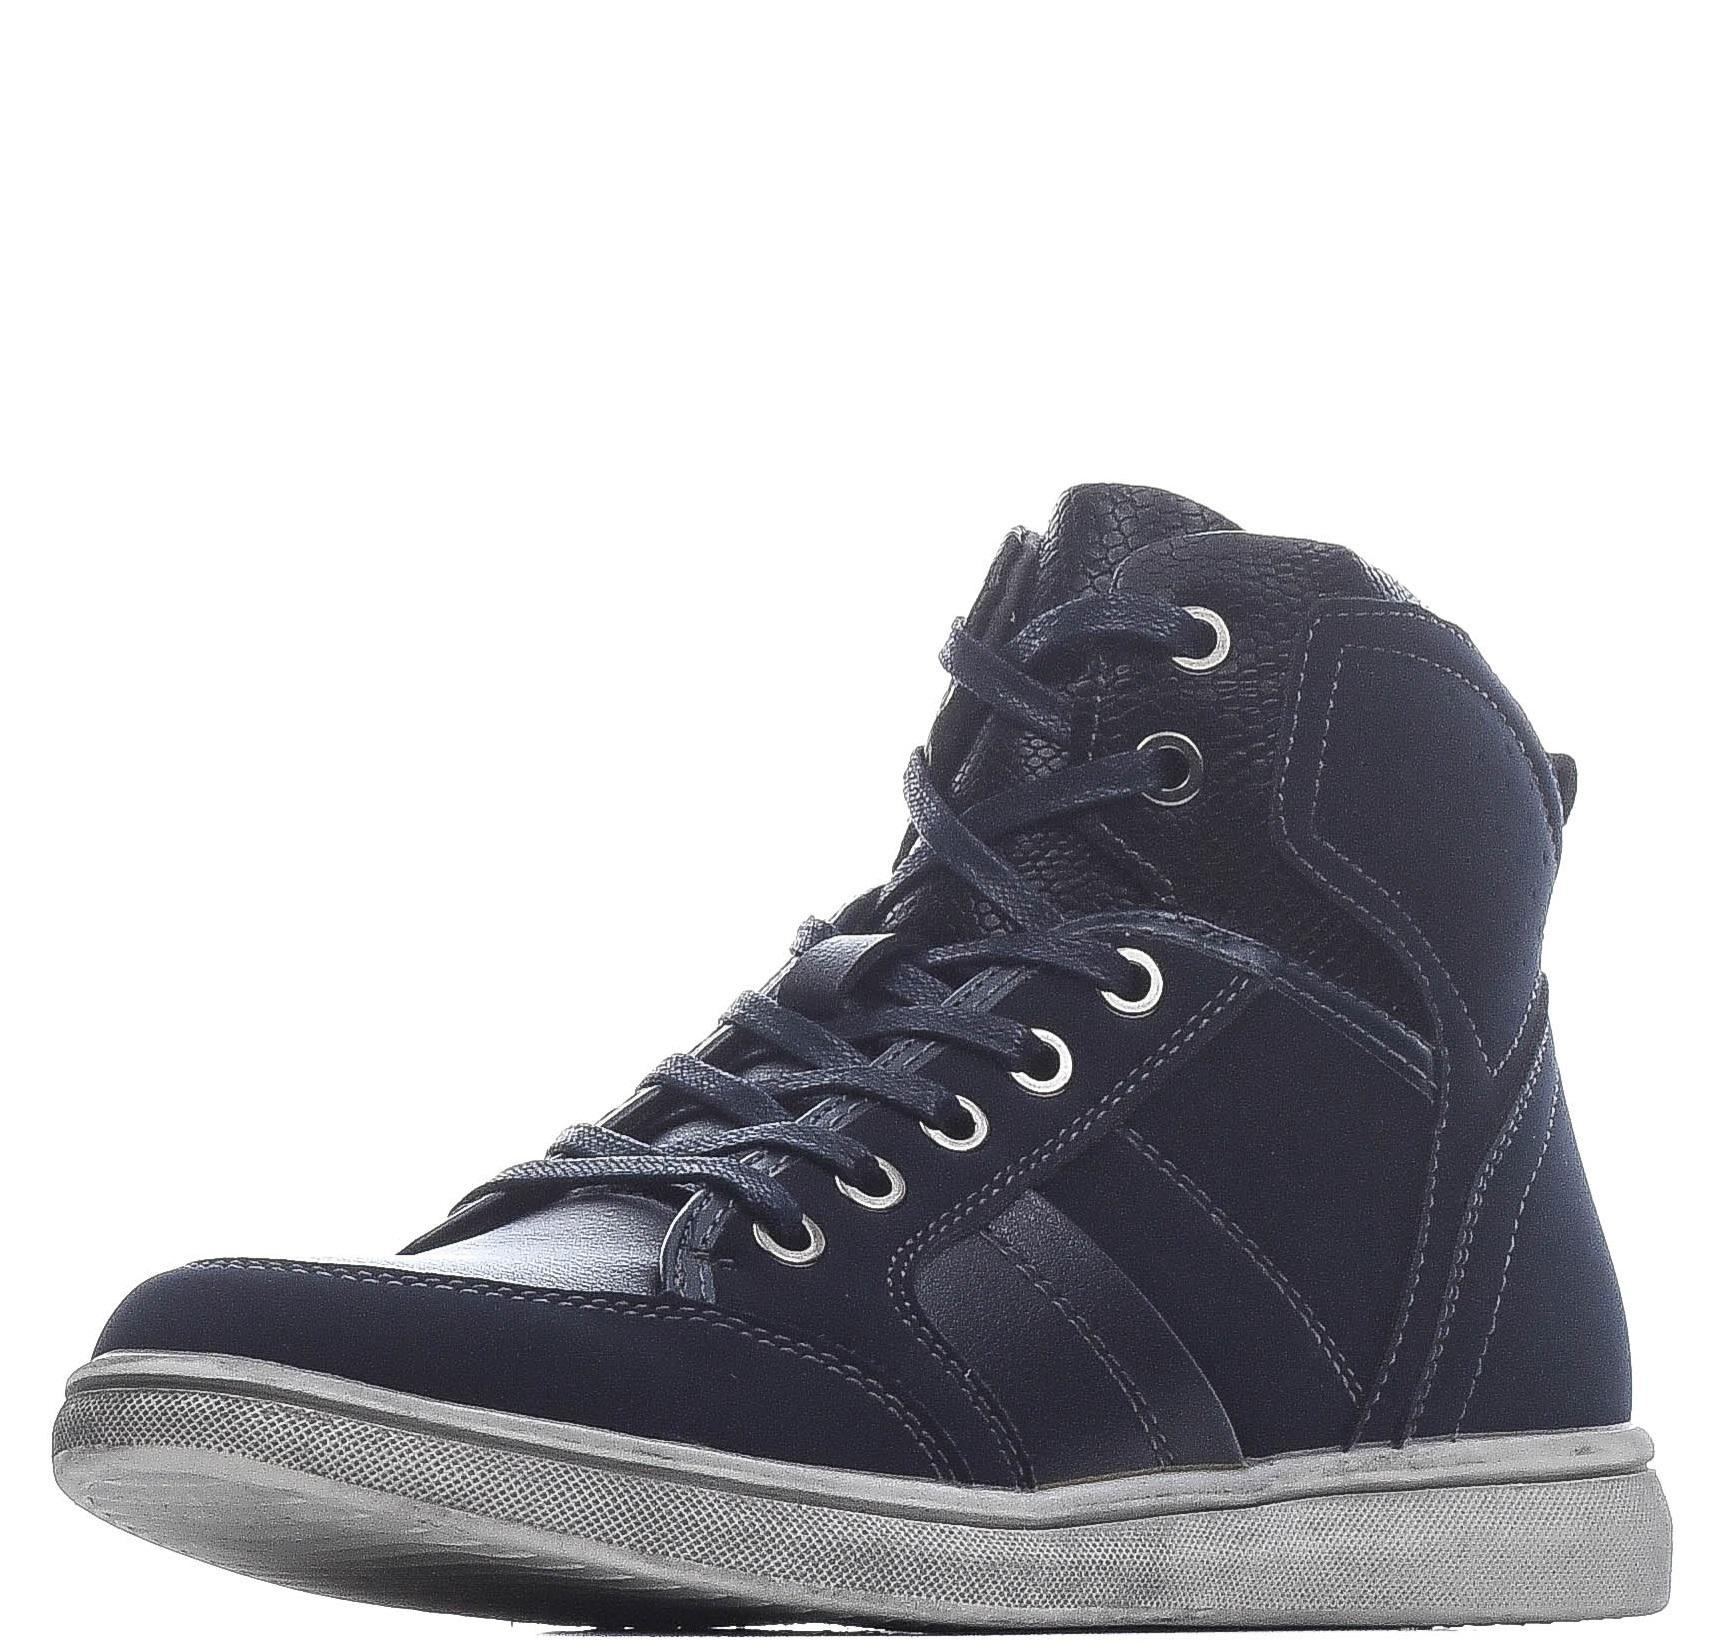 Купить 98-01BO-005GT, Ботинки для мальчиков ZENDEN, цв. синий, р-р 39,